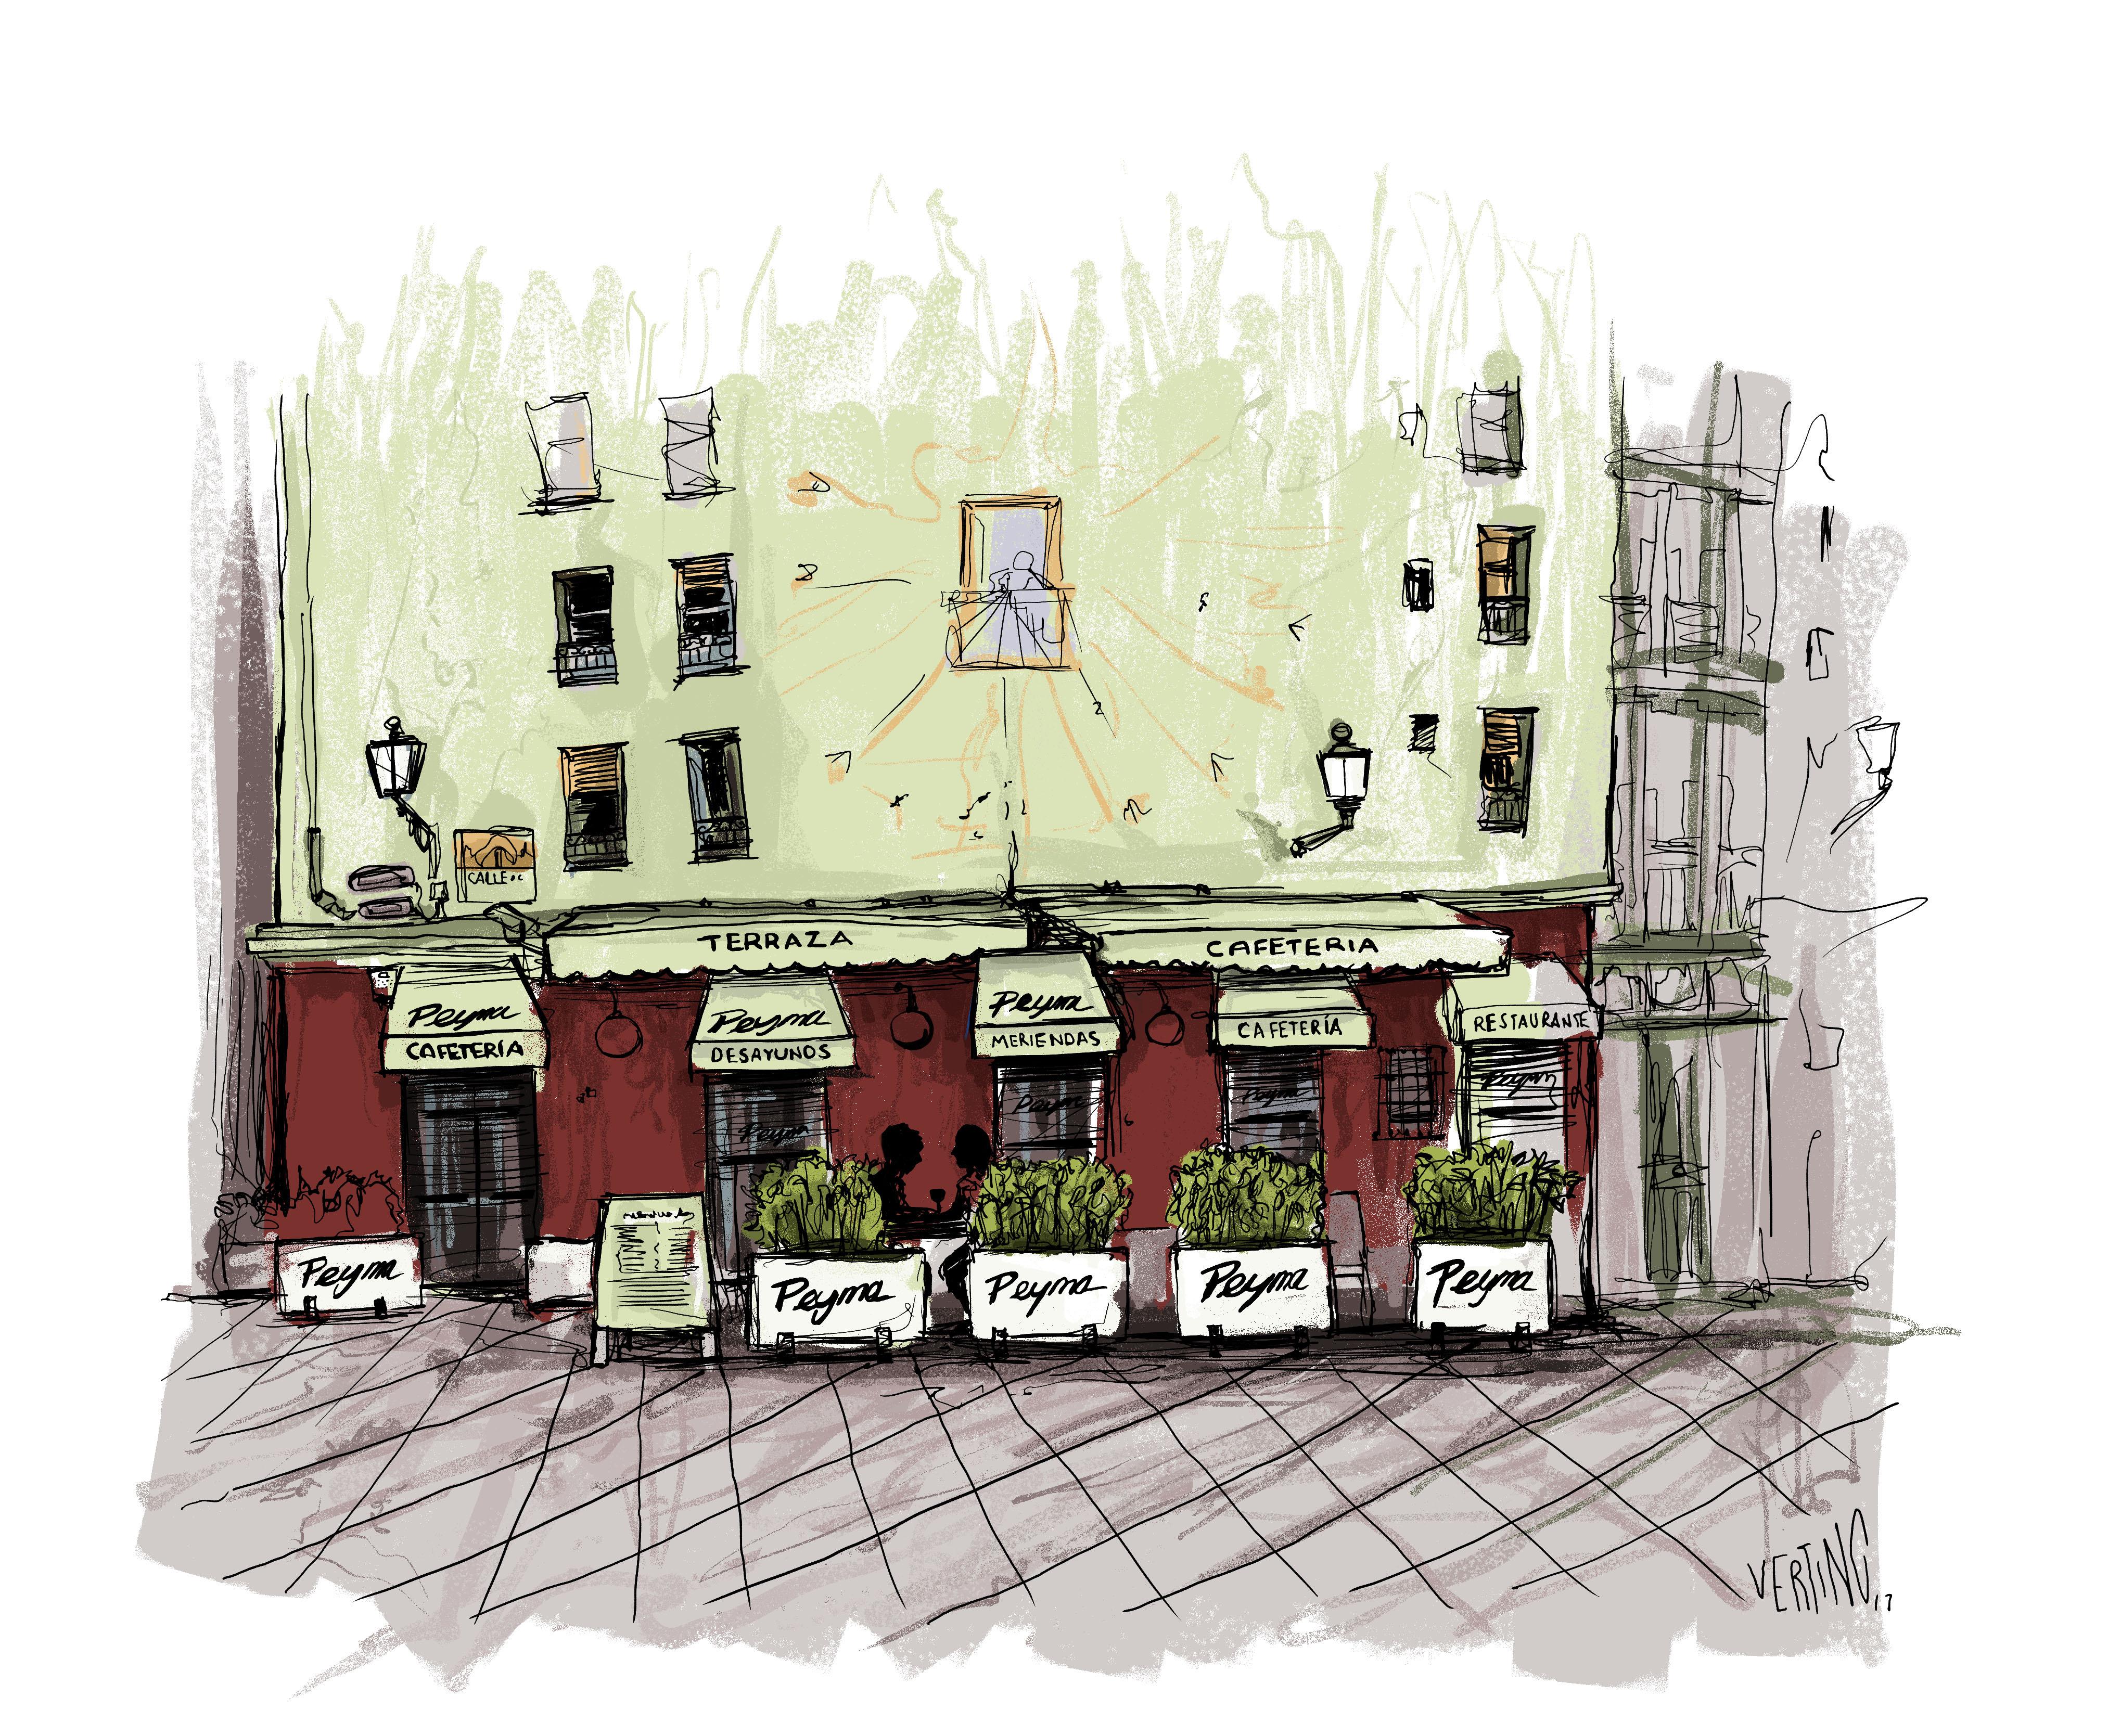 Peyma_Restaurante